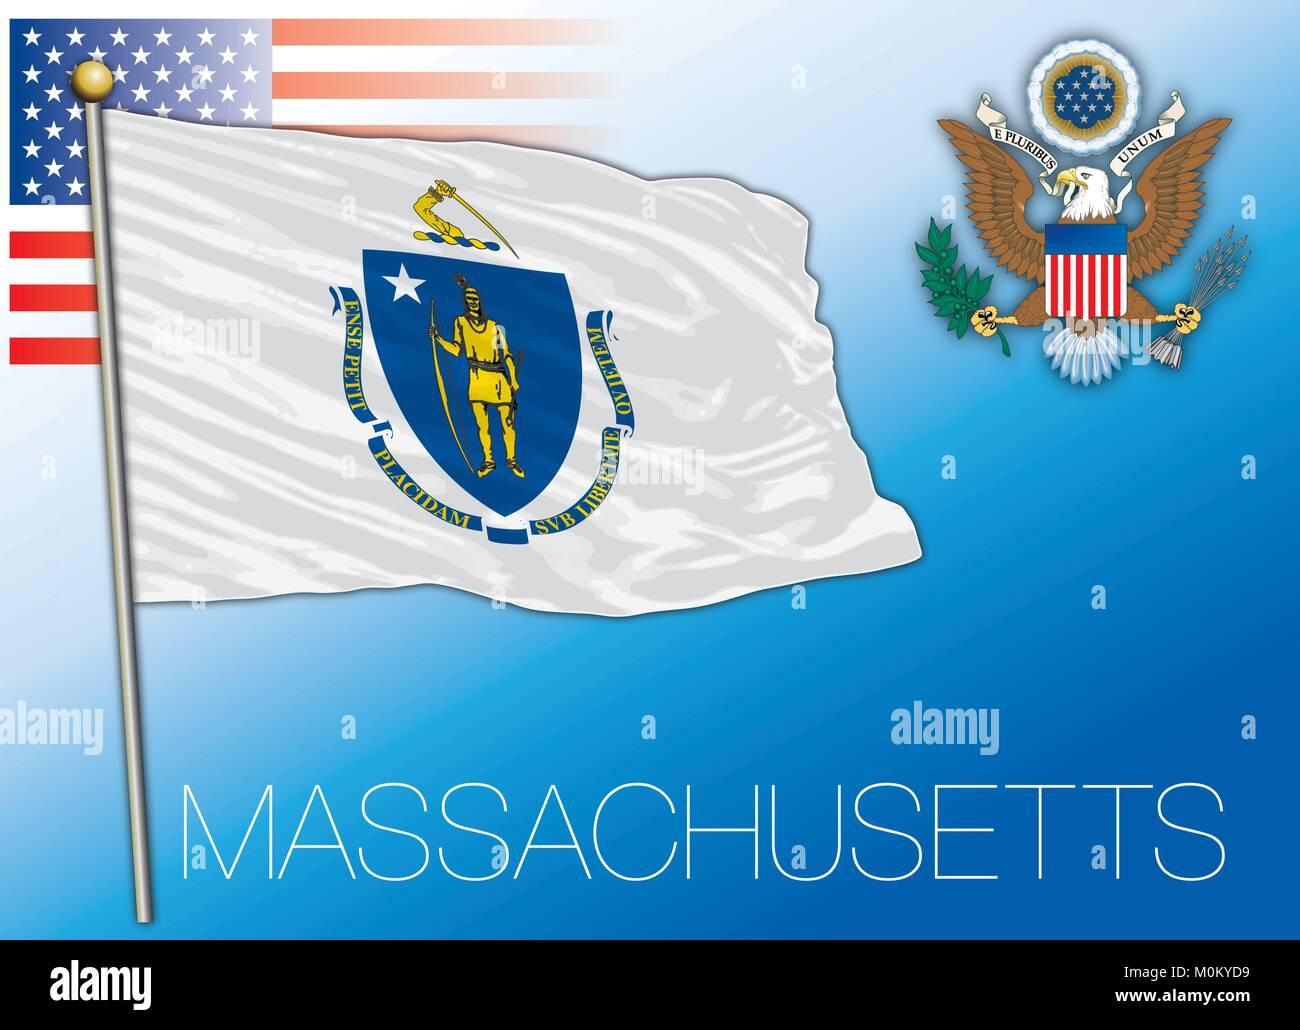 Massachusetts federal state flag, United States - Stock Vector